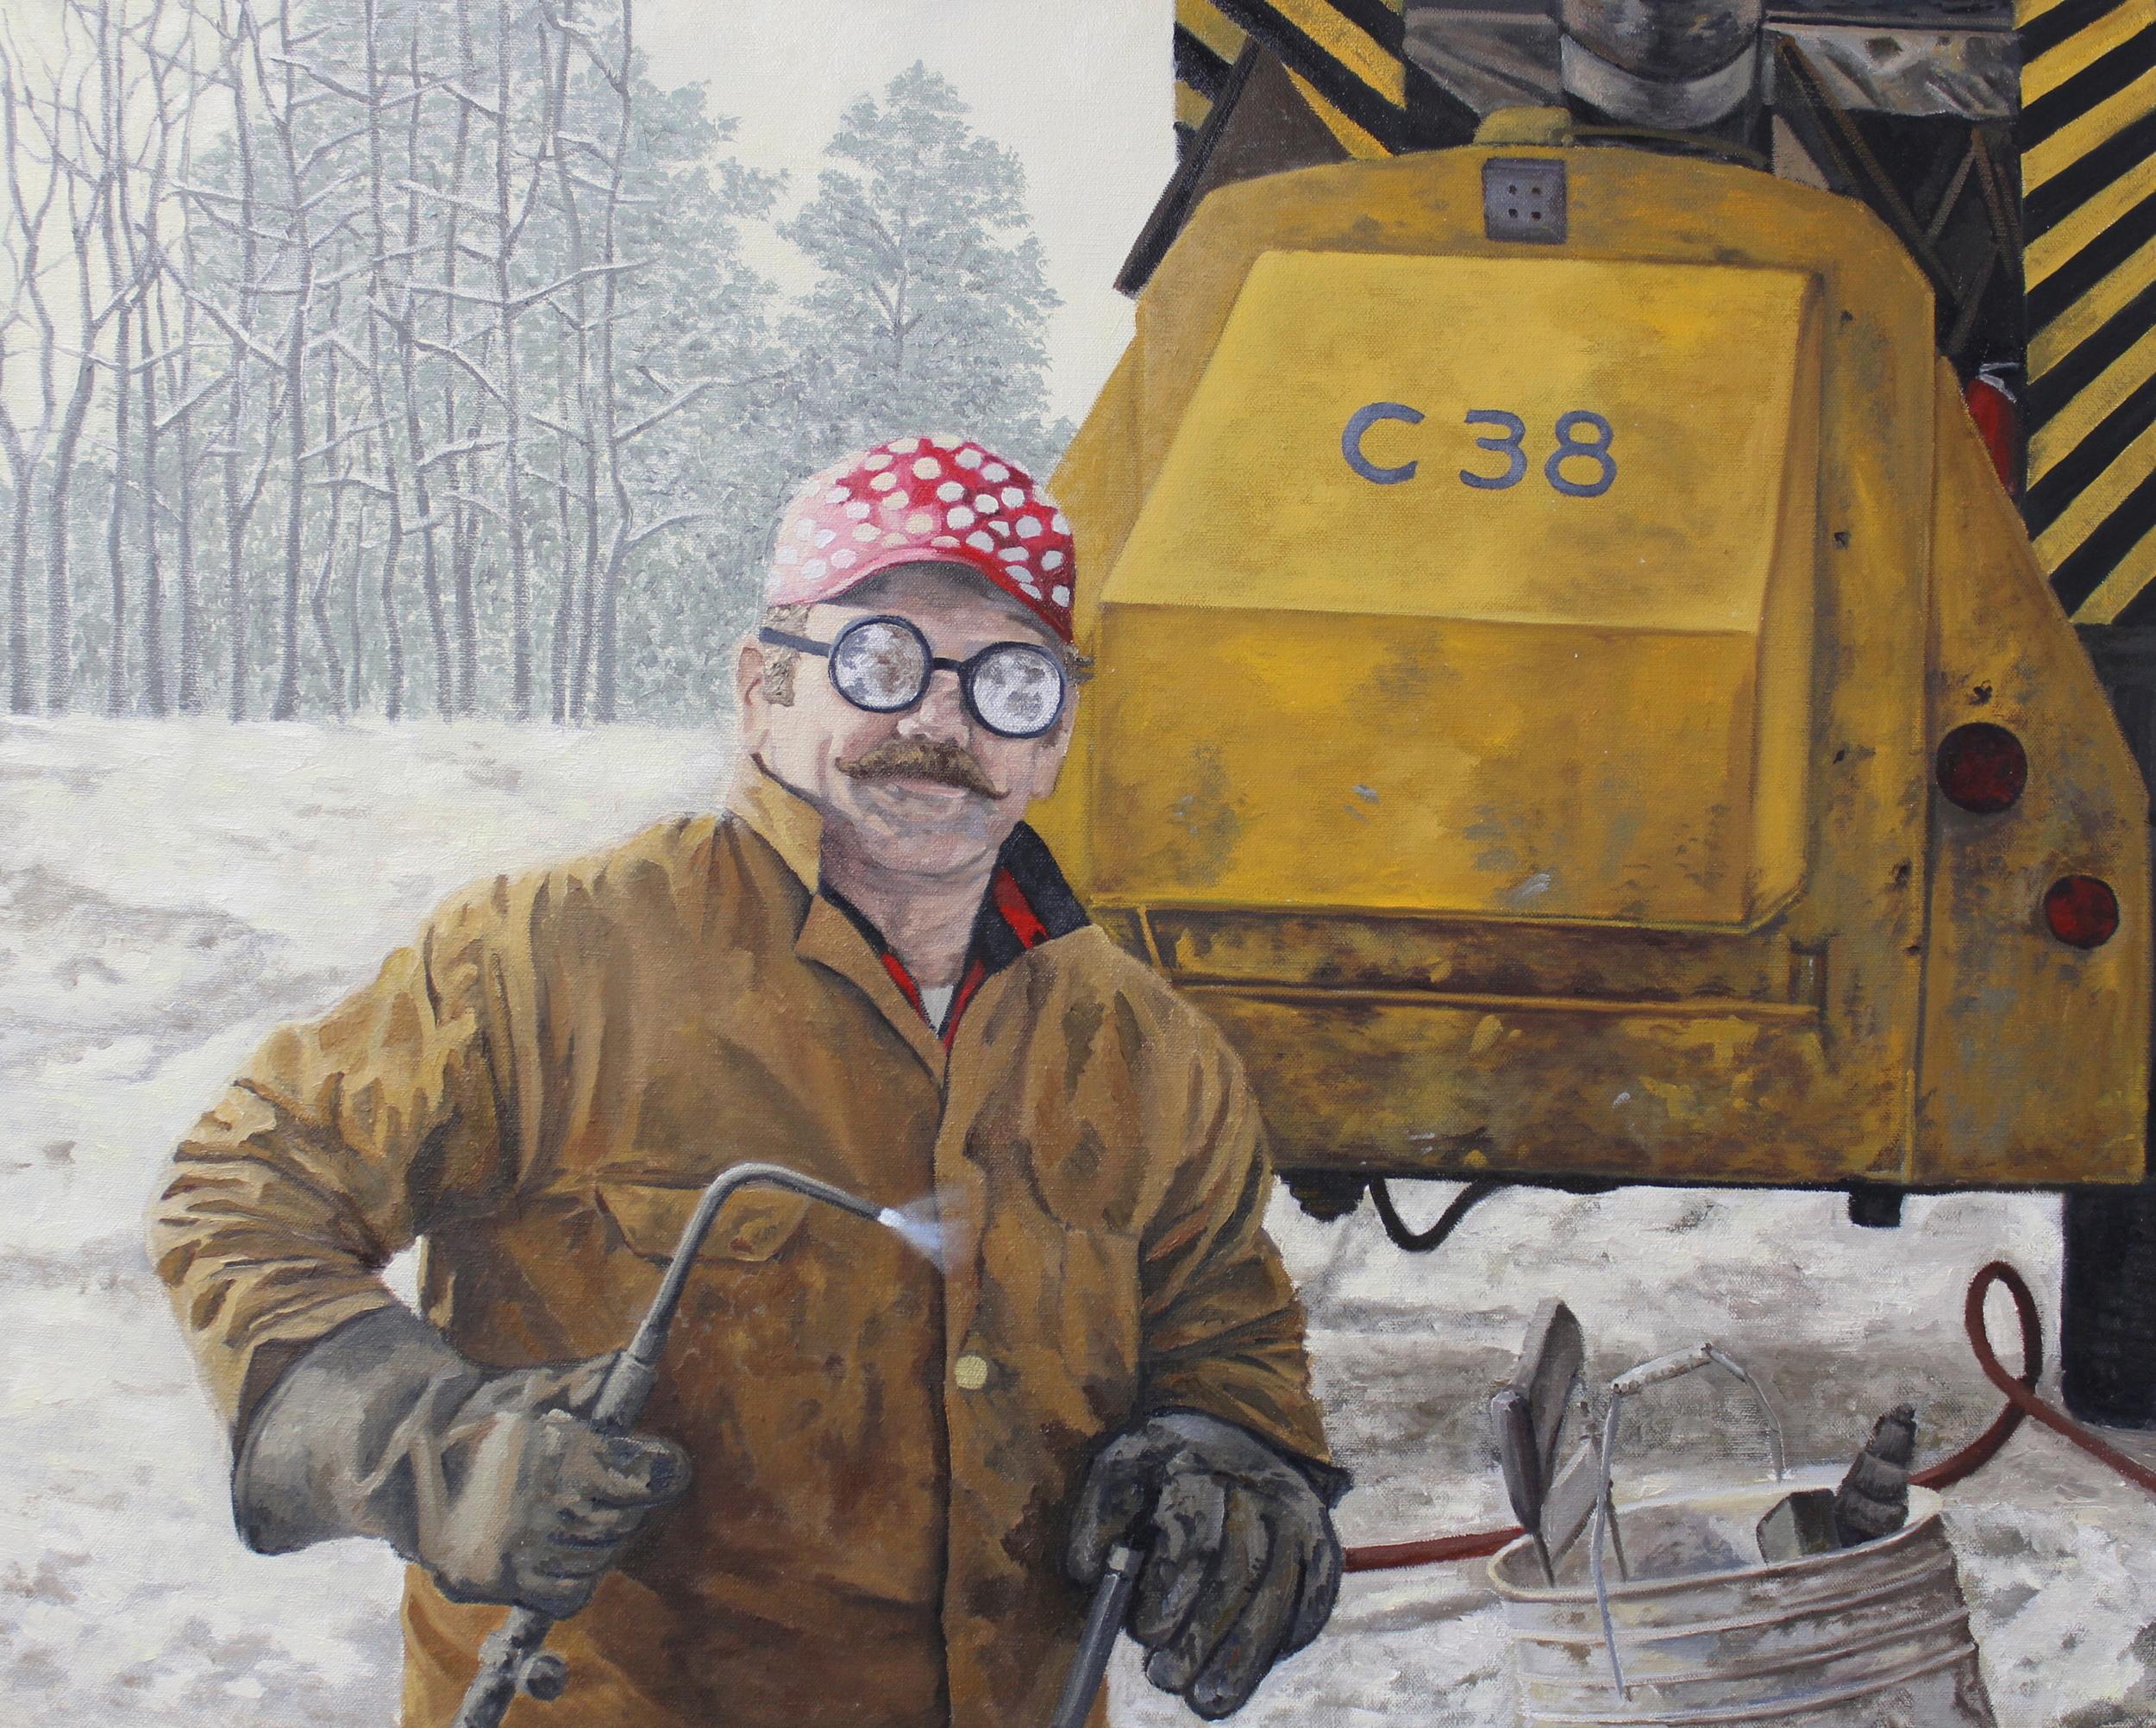 "The Bloke - 29.5"" x 23.5"" - Oil on Canvas - 2014 - Michael Burris Johnson"